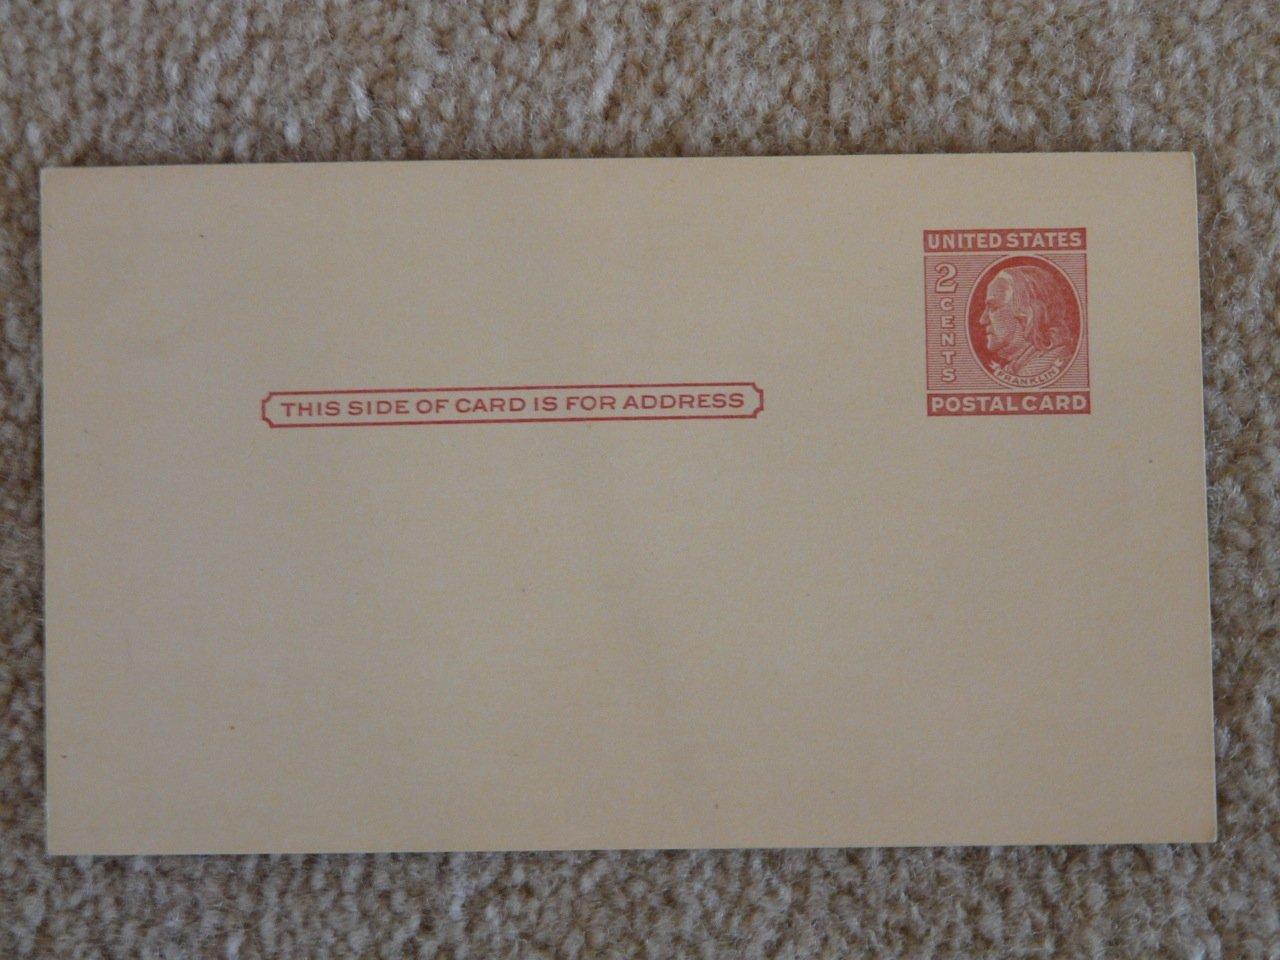 Amazon Vintage United States Postal Card 2 Cents Franklin